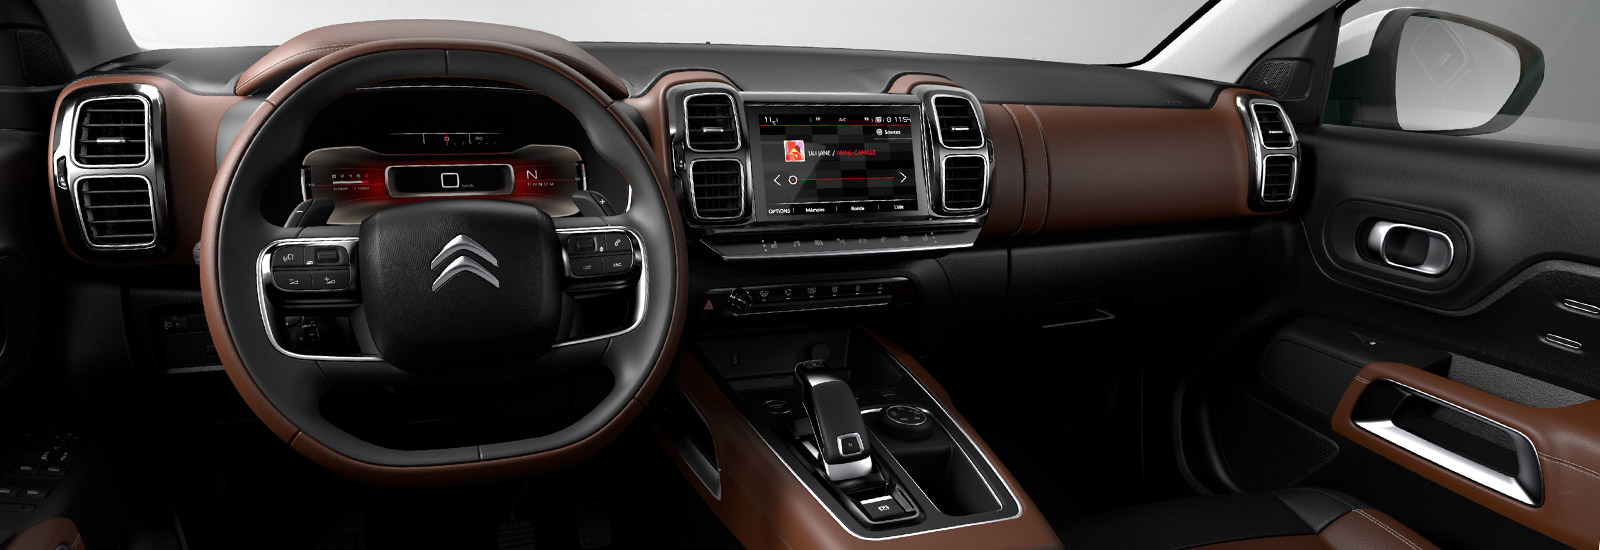 Image Result For Audi A Fiyat